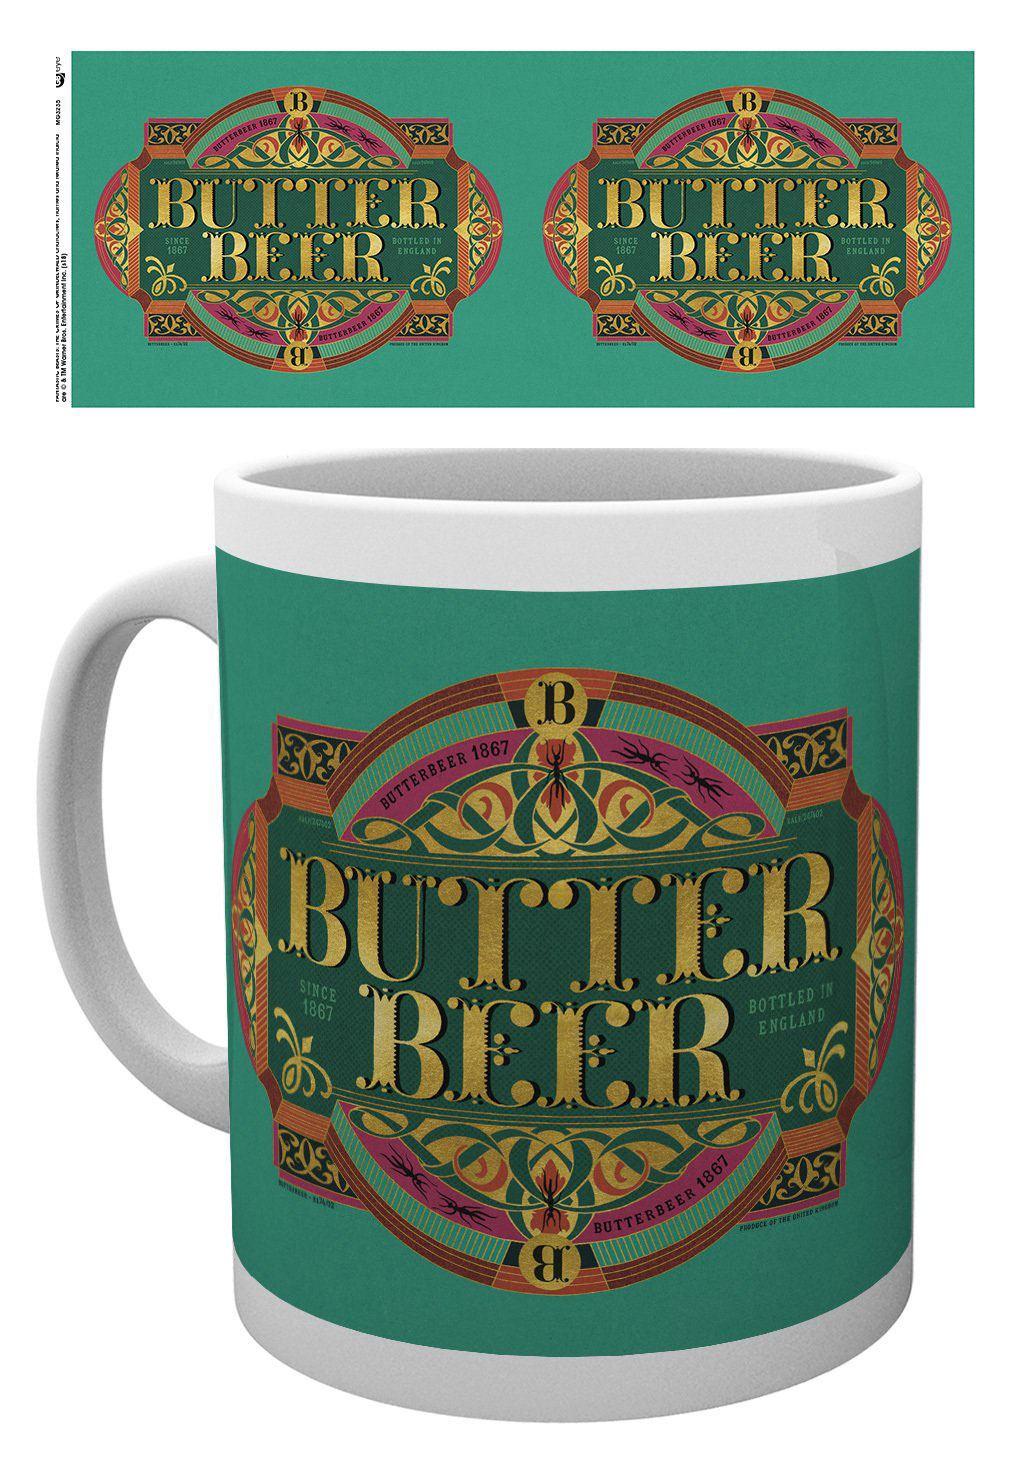 Fantastic Beasts 2 Mug Wizarding Brew